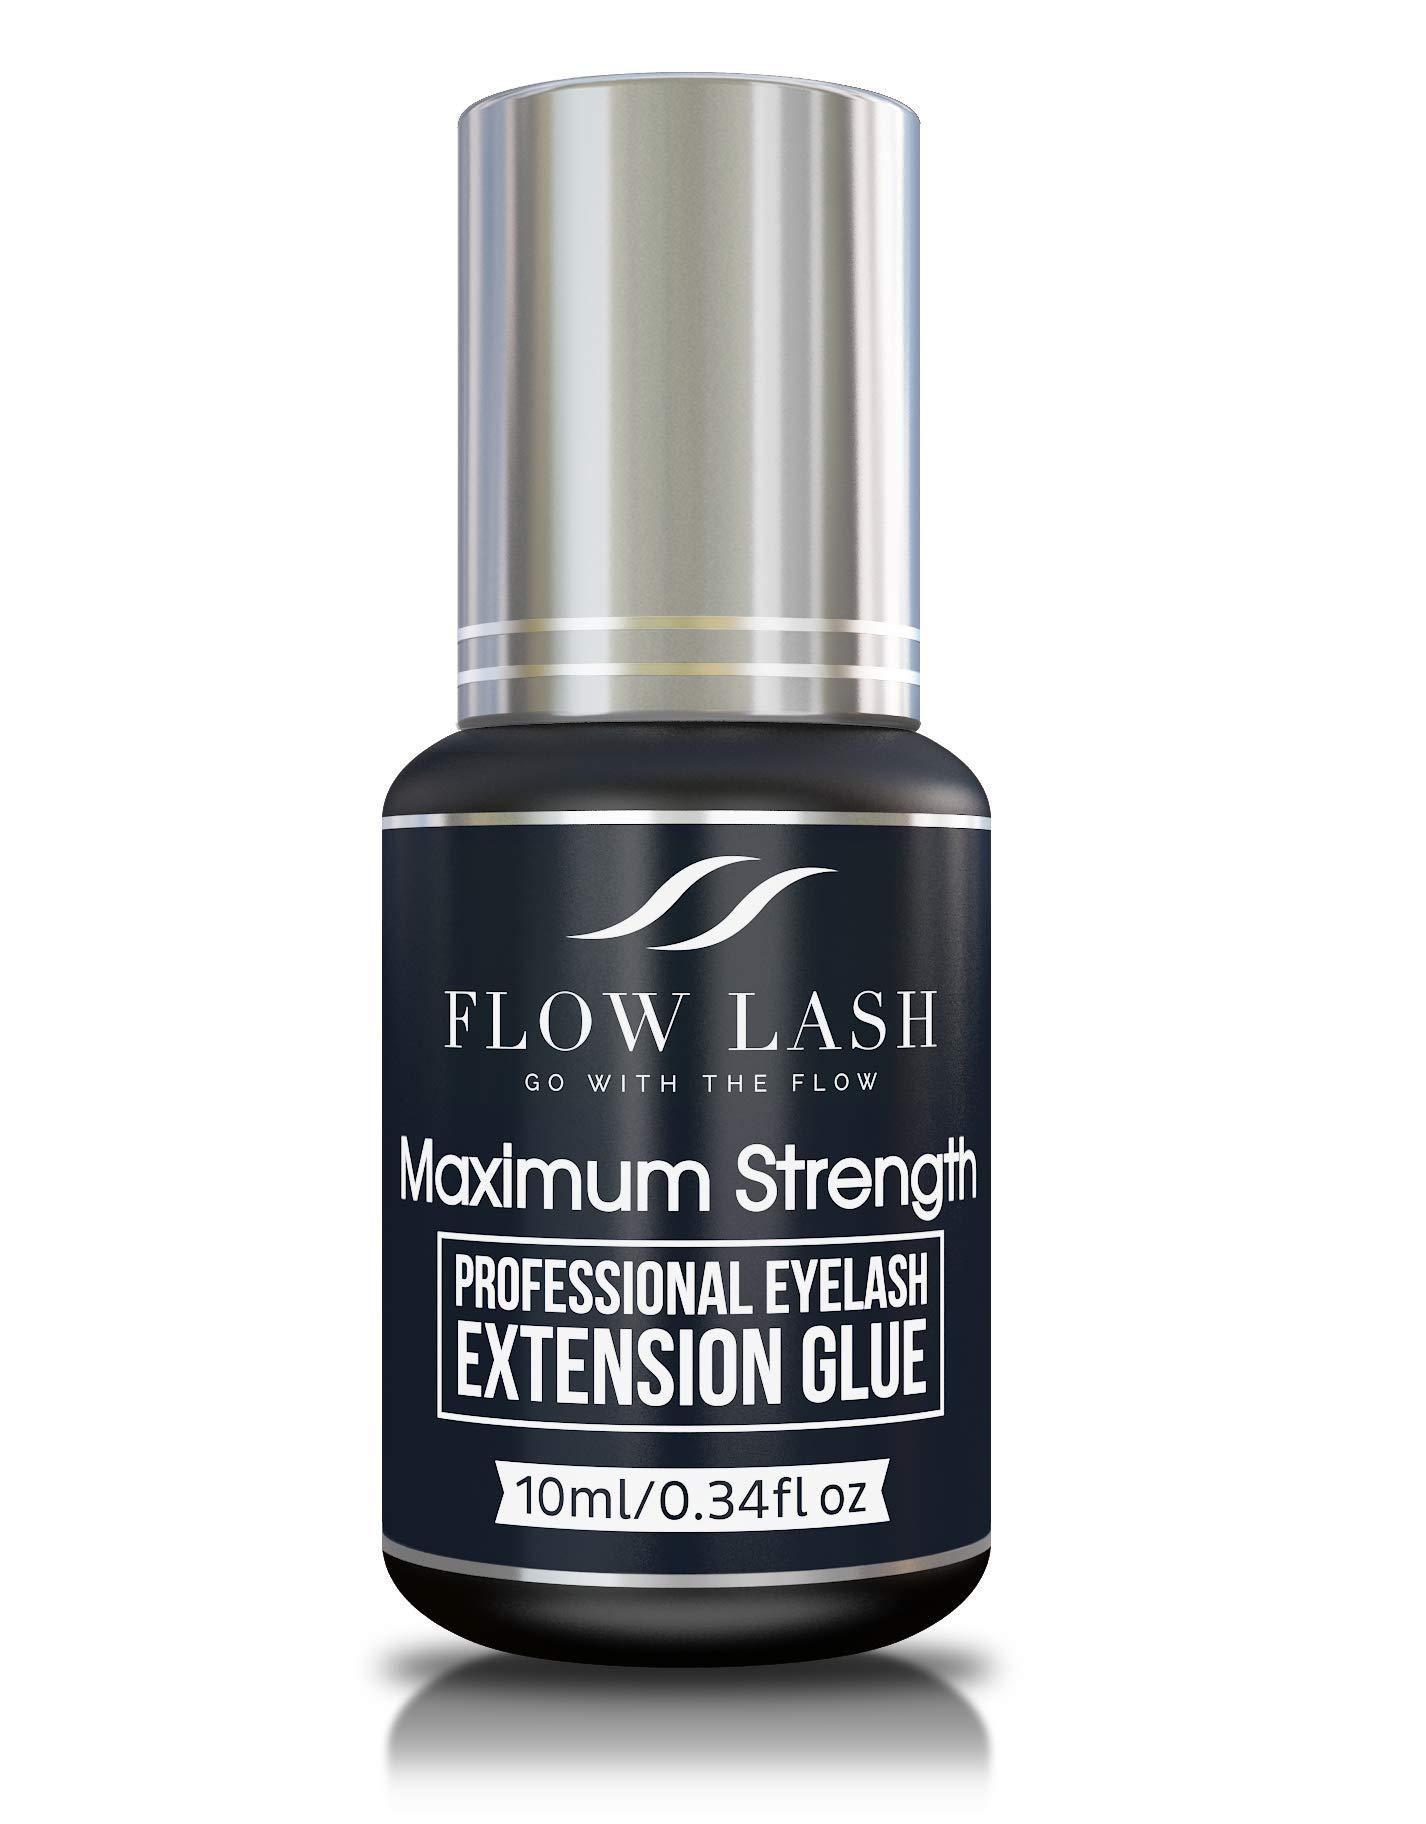 Strongest Eyelash Extension Glue - Maximum Strength, Professional Grade Eyelashes Black Adhesive, Formaldehyde & Latex Free Lashes Supplies, Semi - Permanent Eyelash Glue by Flow Lash, 10mL by Flow Lash